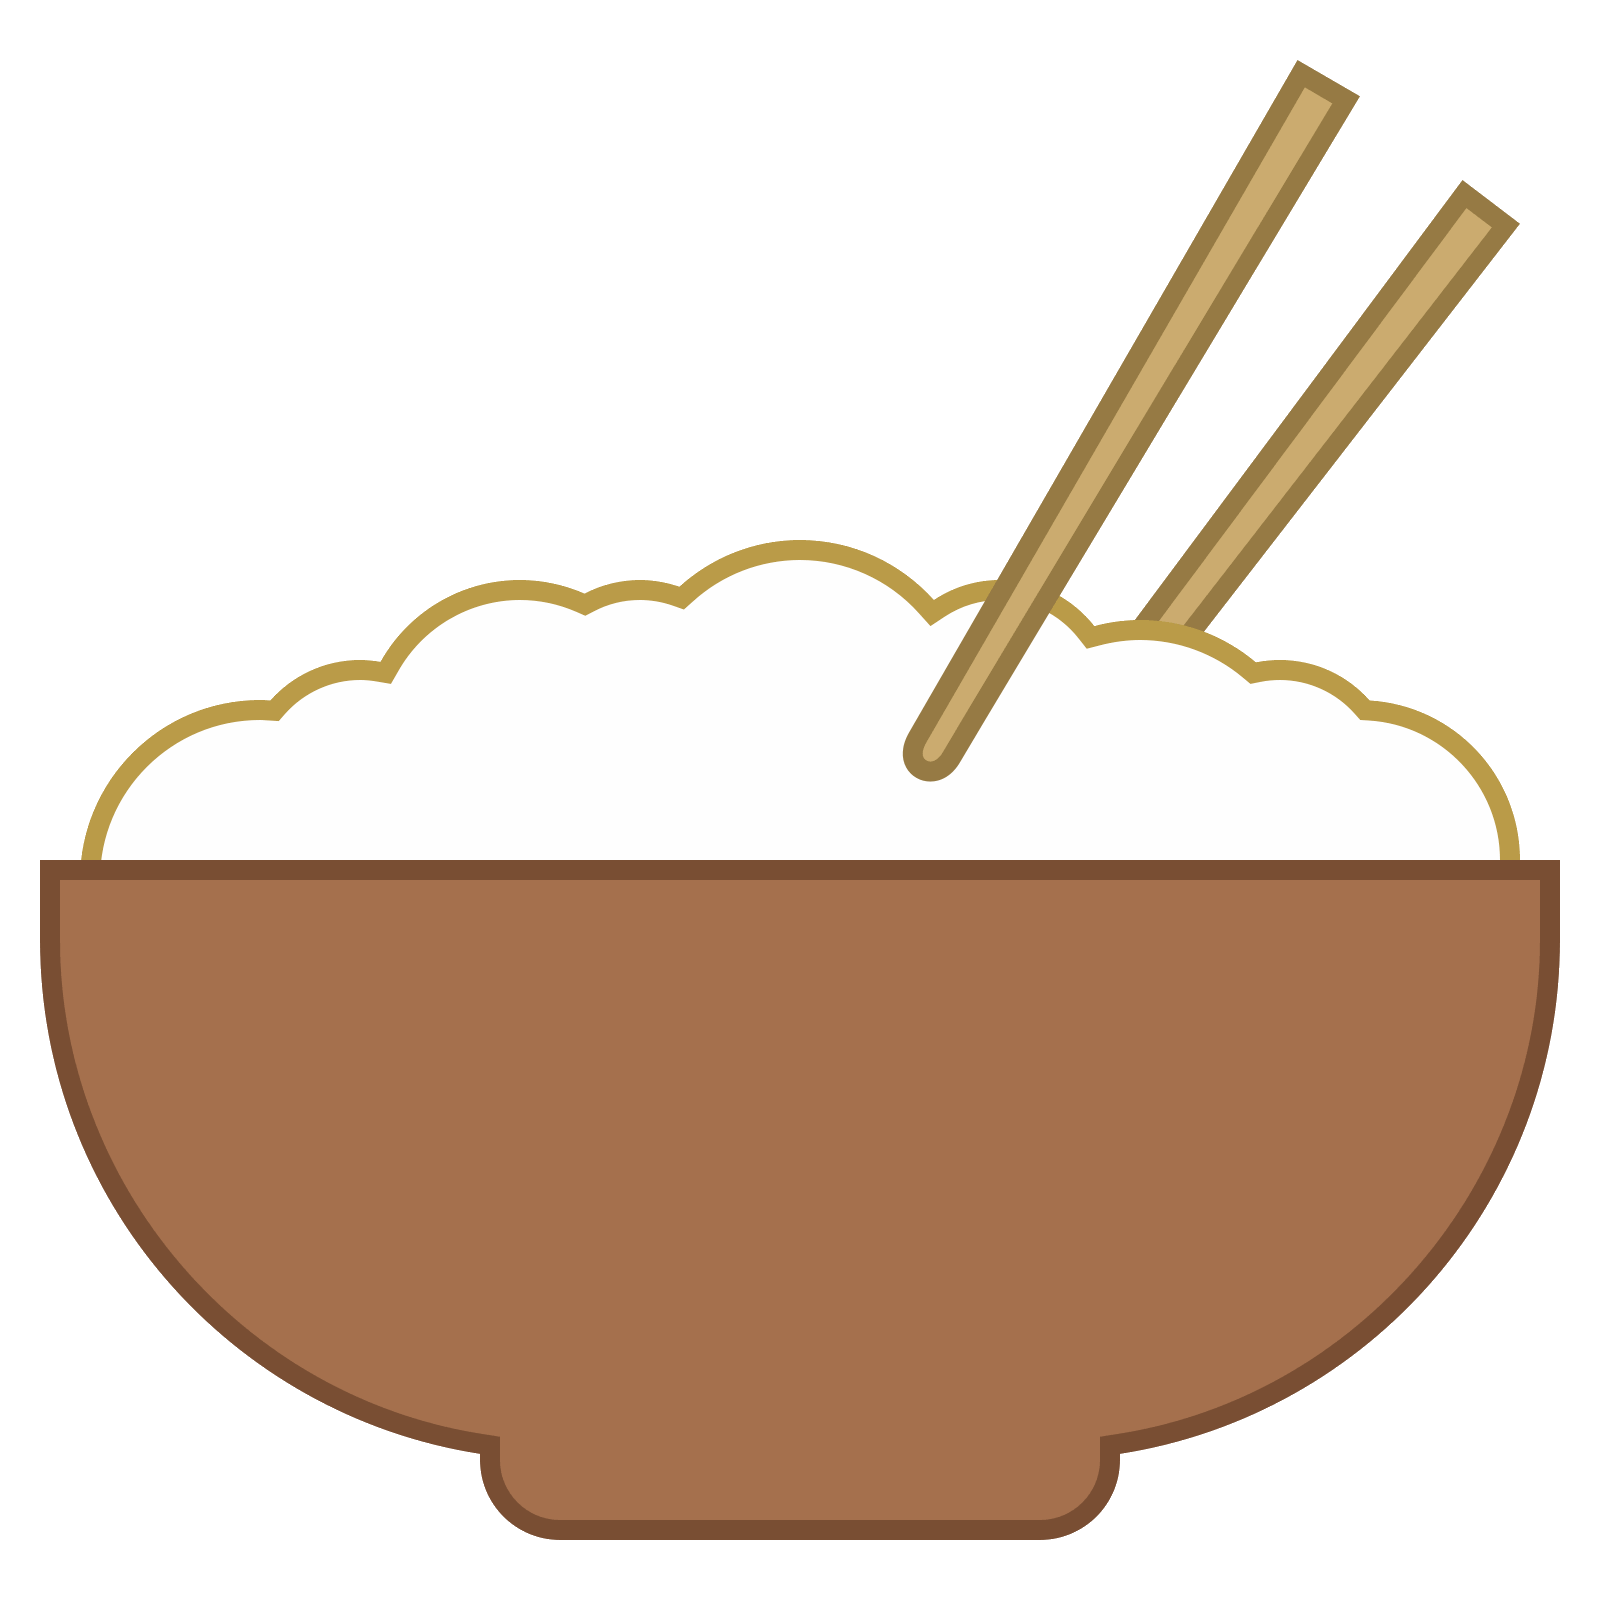 vector free library Rice vector. Miska ry u icon